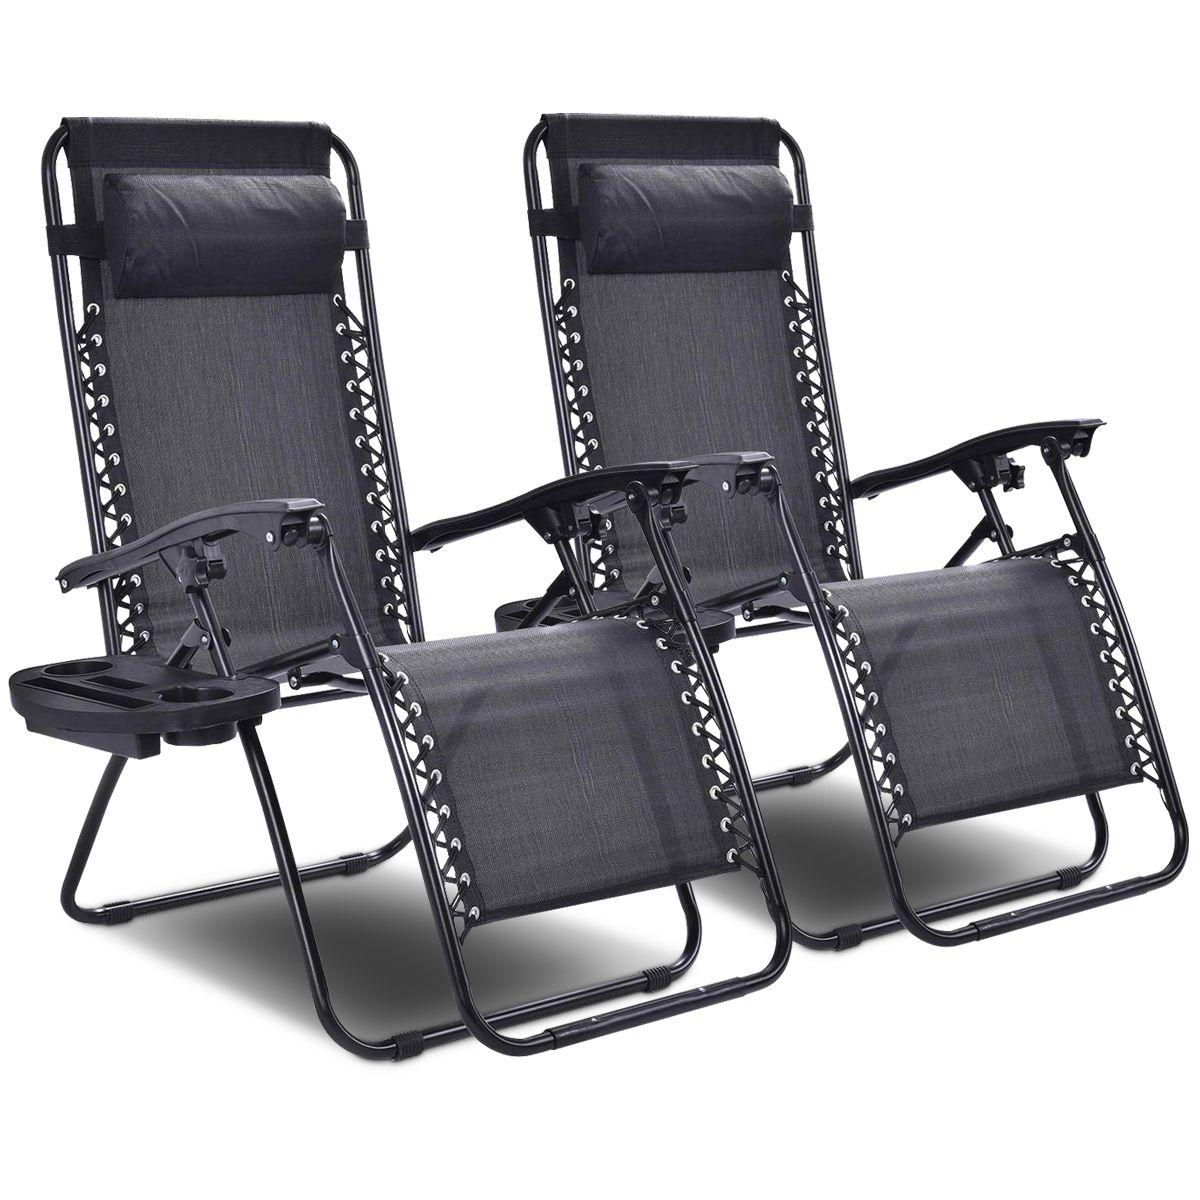 2PC Zero Gravity Chair Adjustable Recliners Textiliene